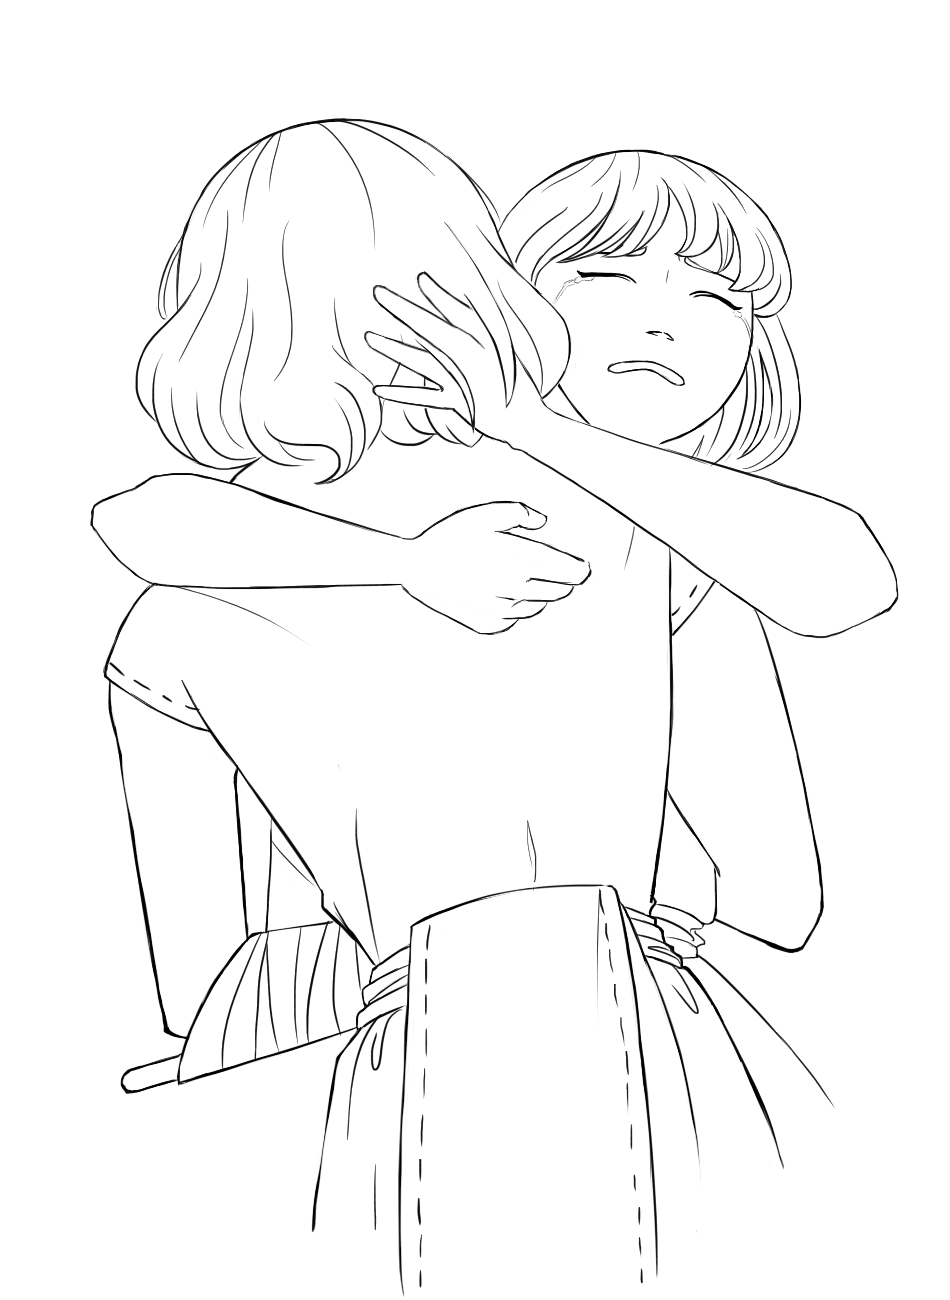 Sano and Anina hugging with Anina facing the front